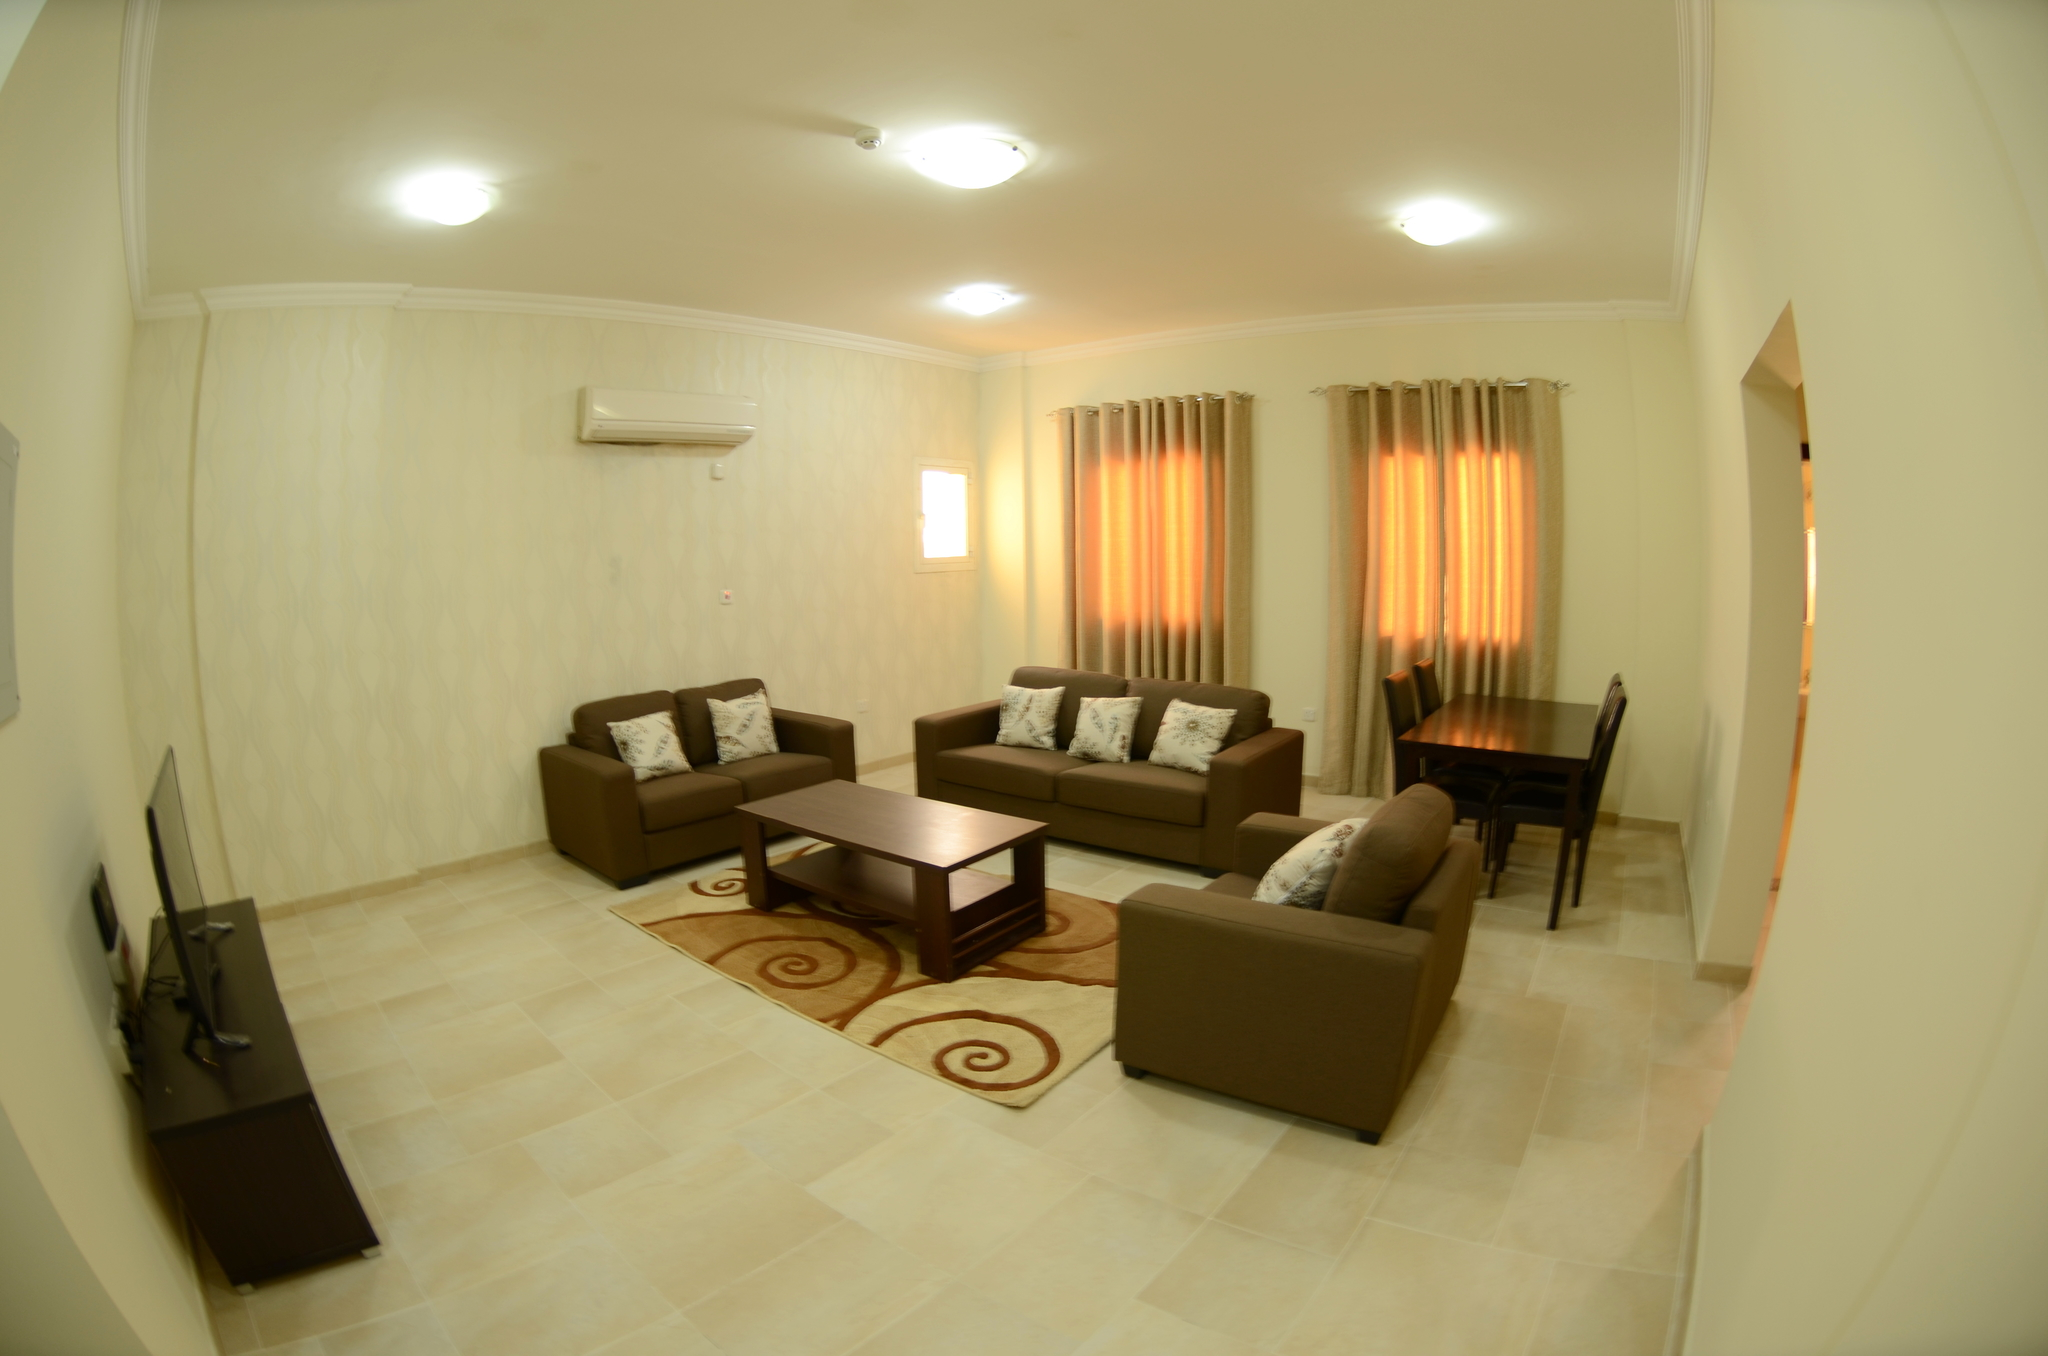 The Lifestyle You Deserve | Stunning 2 BHK | AL Nasr Area